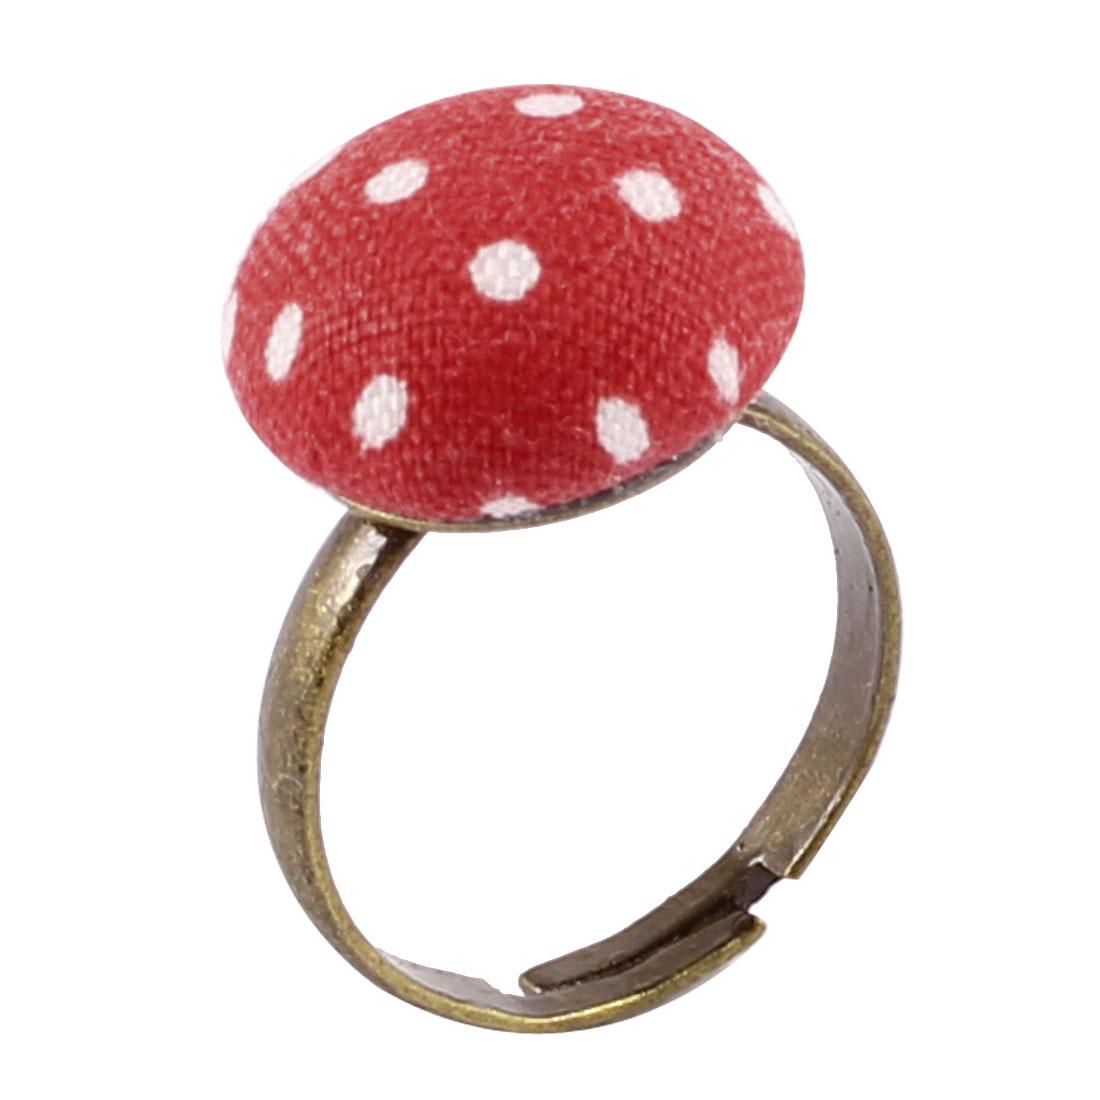 Bronze Tone Metal White Dot Print Red Mushroom Detail Finger Ring US 6 1/2